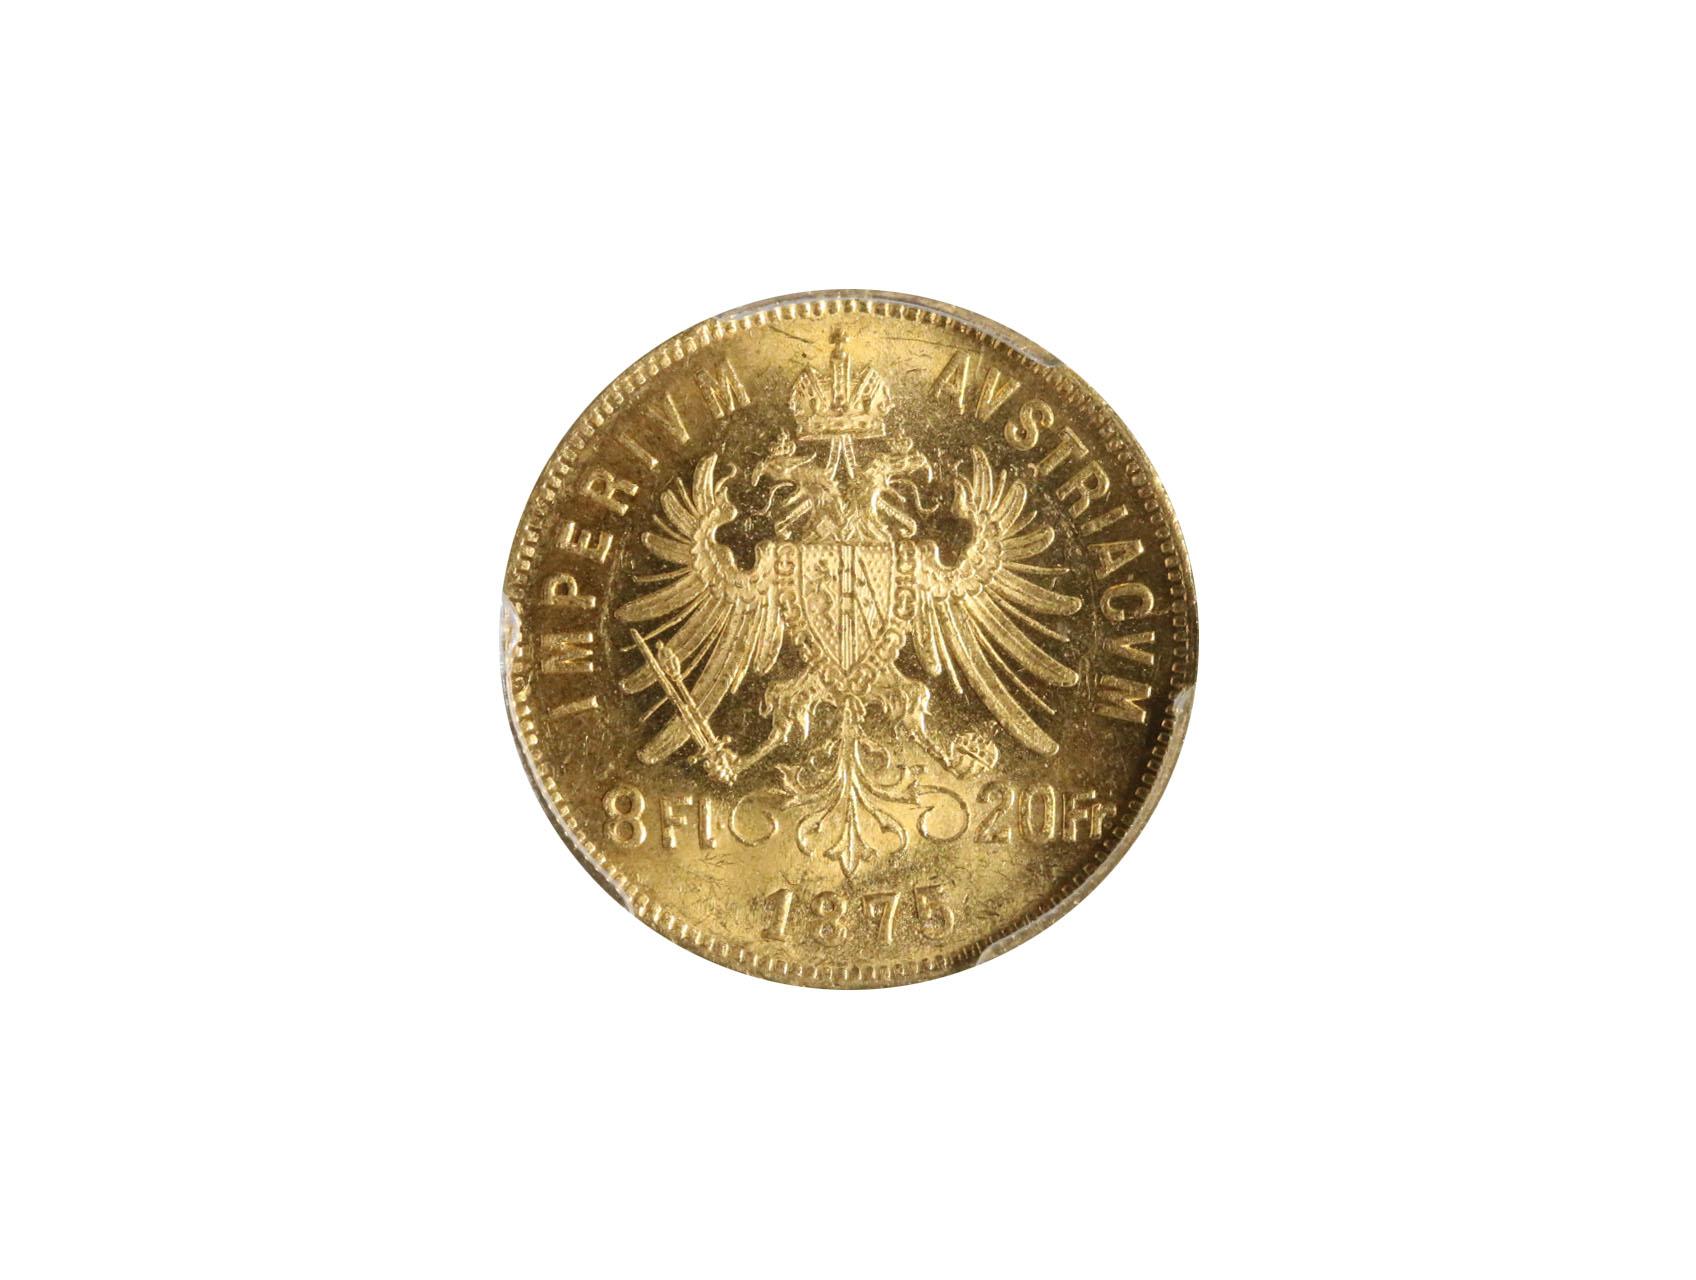 František Josef I. 1848-1916 - 8 Zlatník 1875, VN126, PCGS MS62